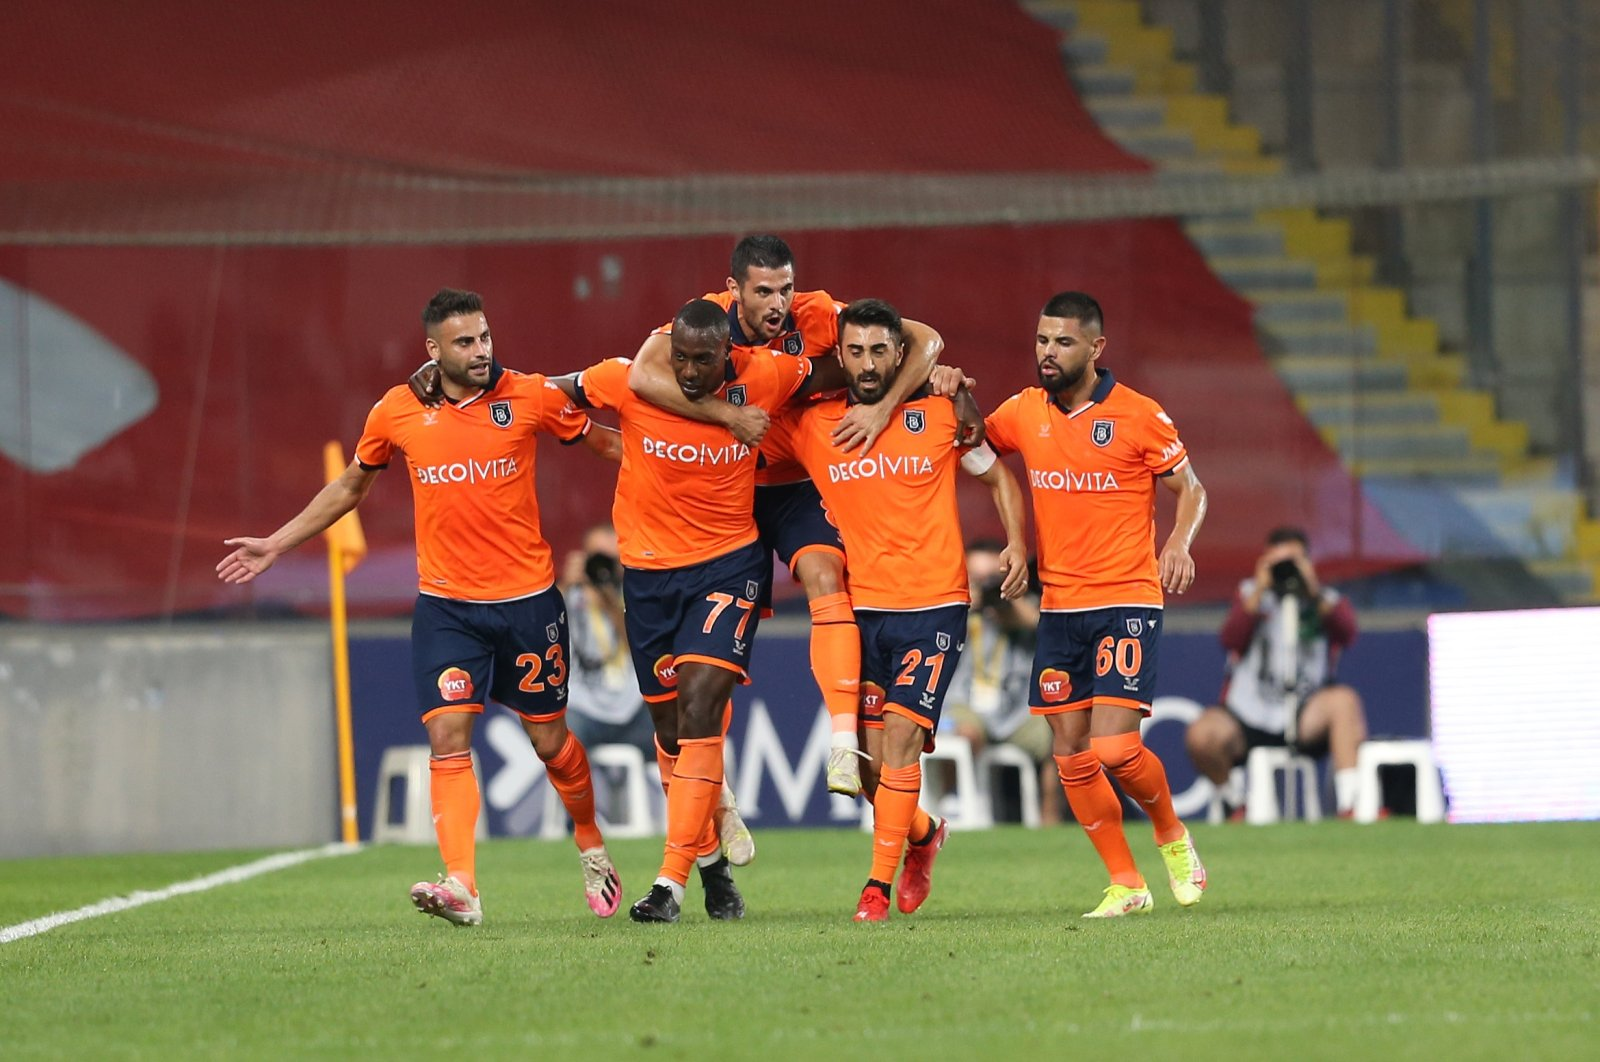 Medipol Başakşehir players celebrate after scoring a goal against Fenerbahçe at the Basakşehir Fatih Terim Stadium in Istanbul, Turkey, Sept. 19, 2021. (AA Photo)